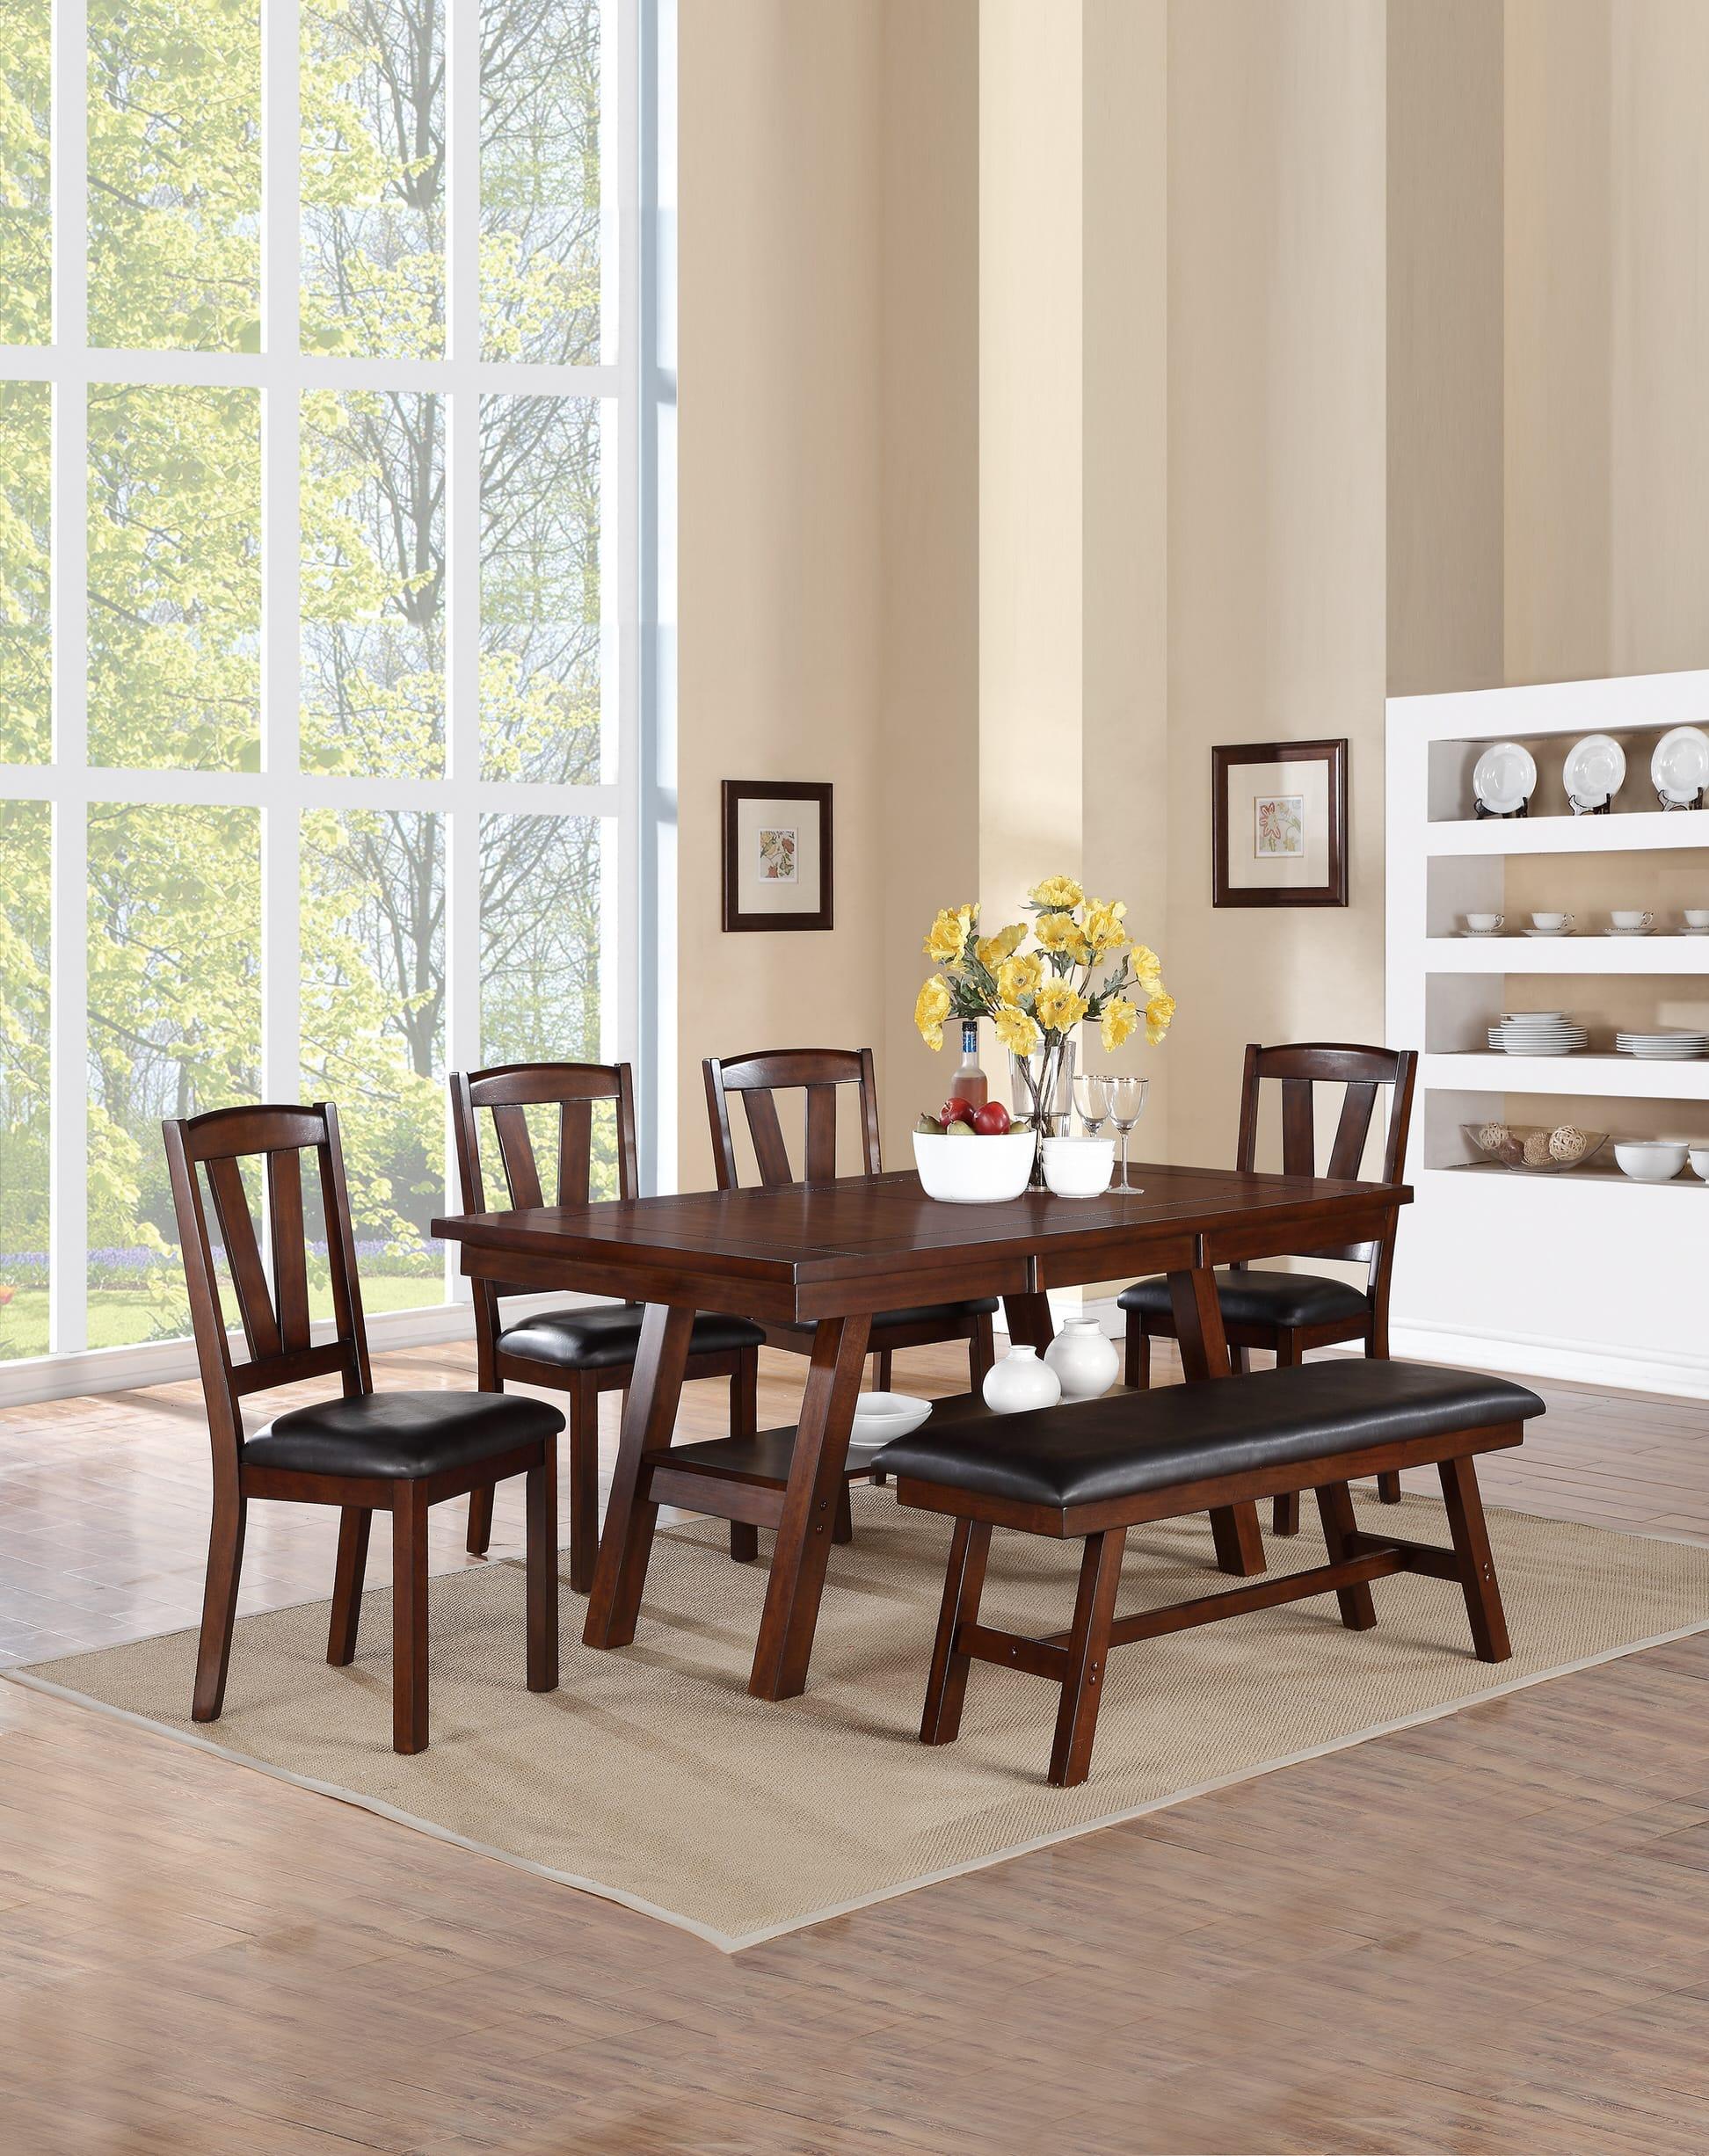 F1331 Dark Walnut Dining Chair (Set of 2) by Poundex